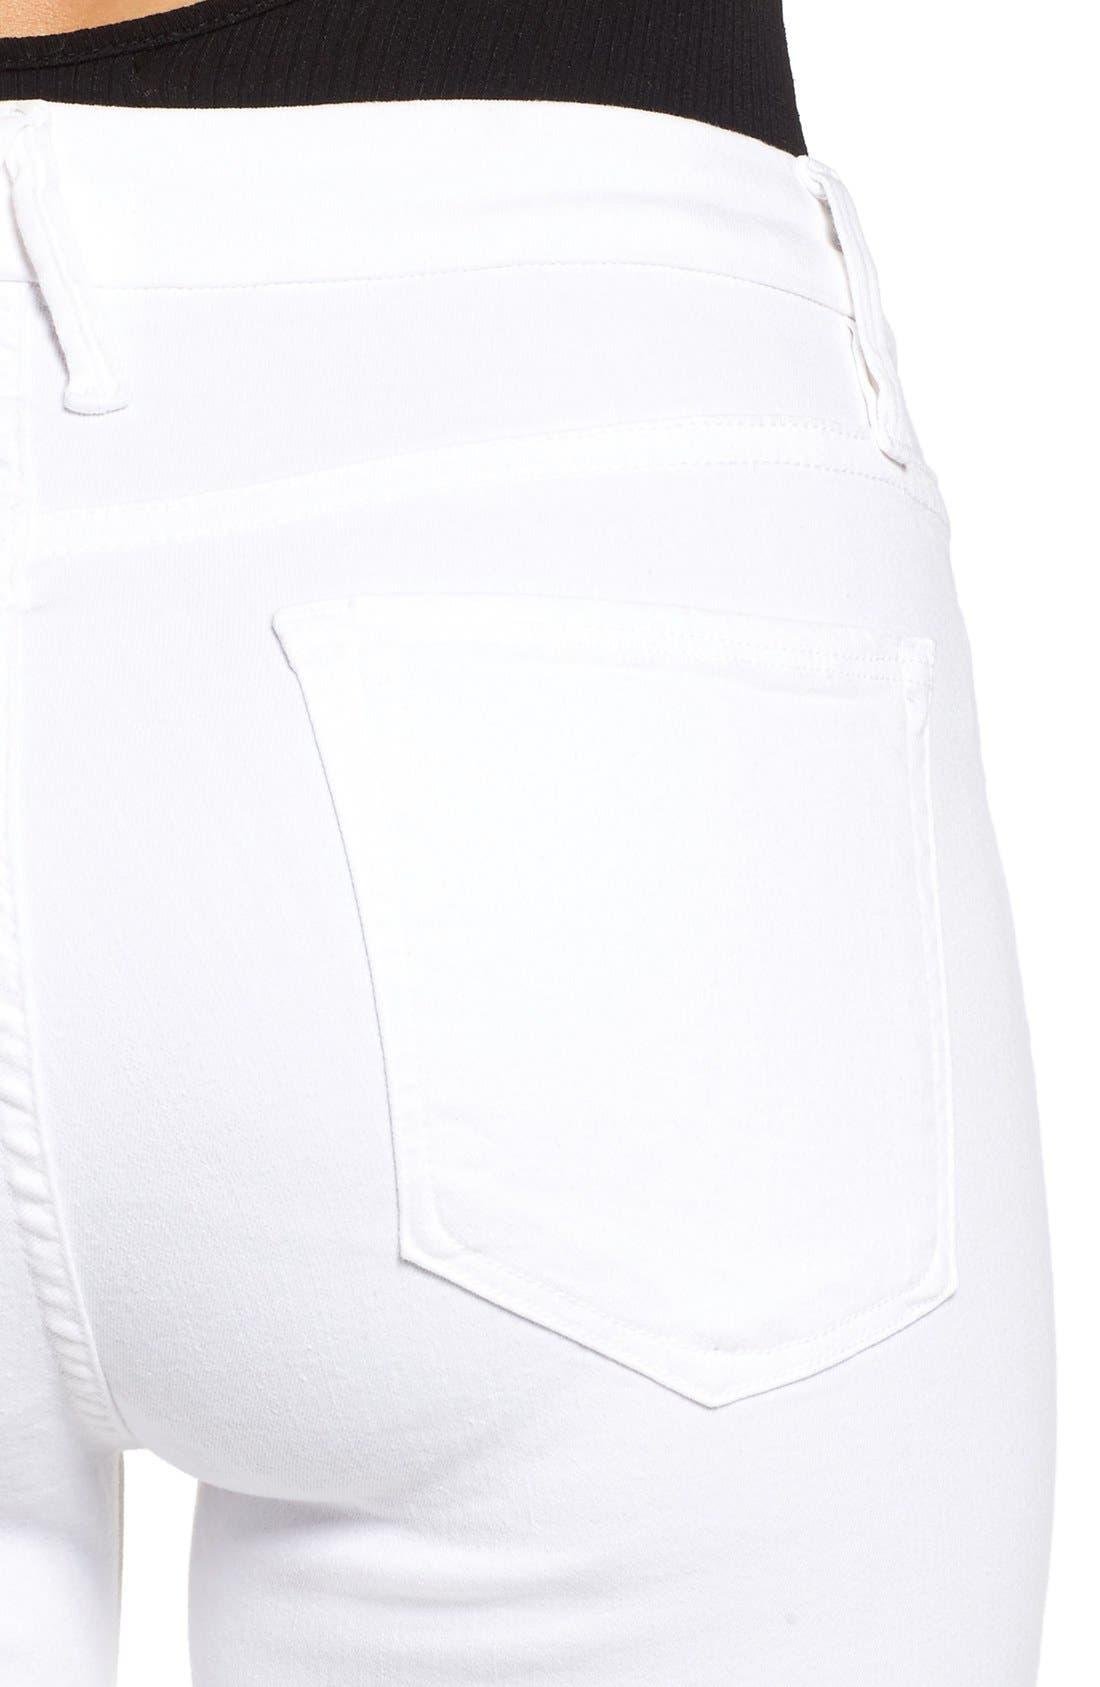 Alternate Image 4  - Good American Good Legs High Rise Skinny Jeans (White 001) (Extended Sizes)